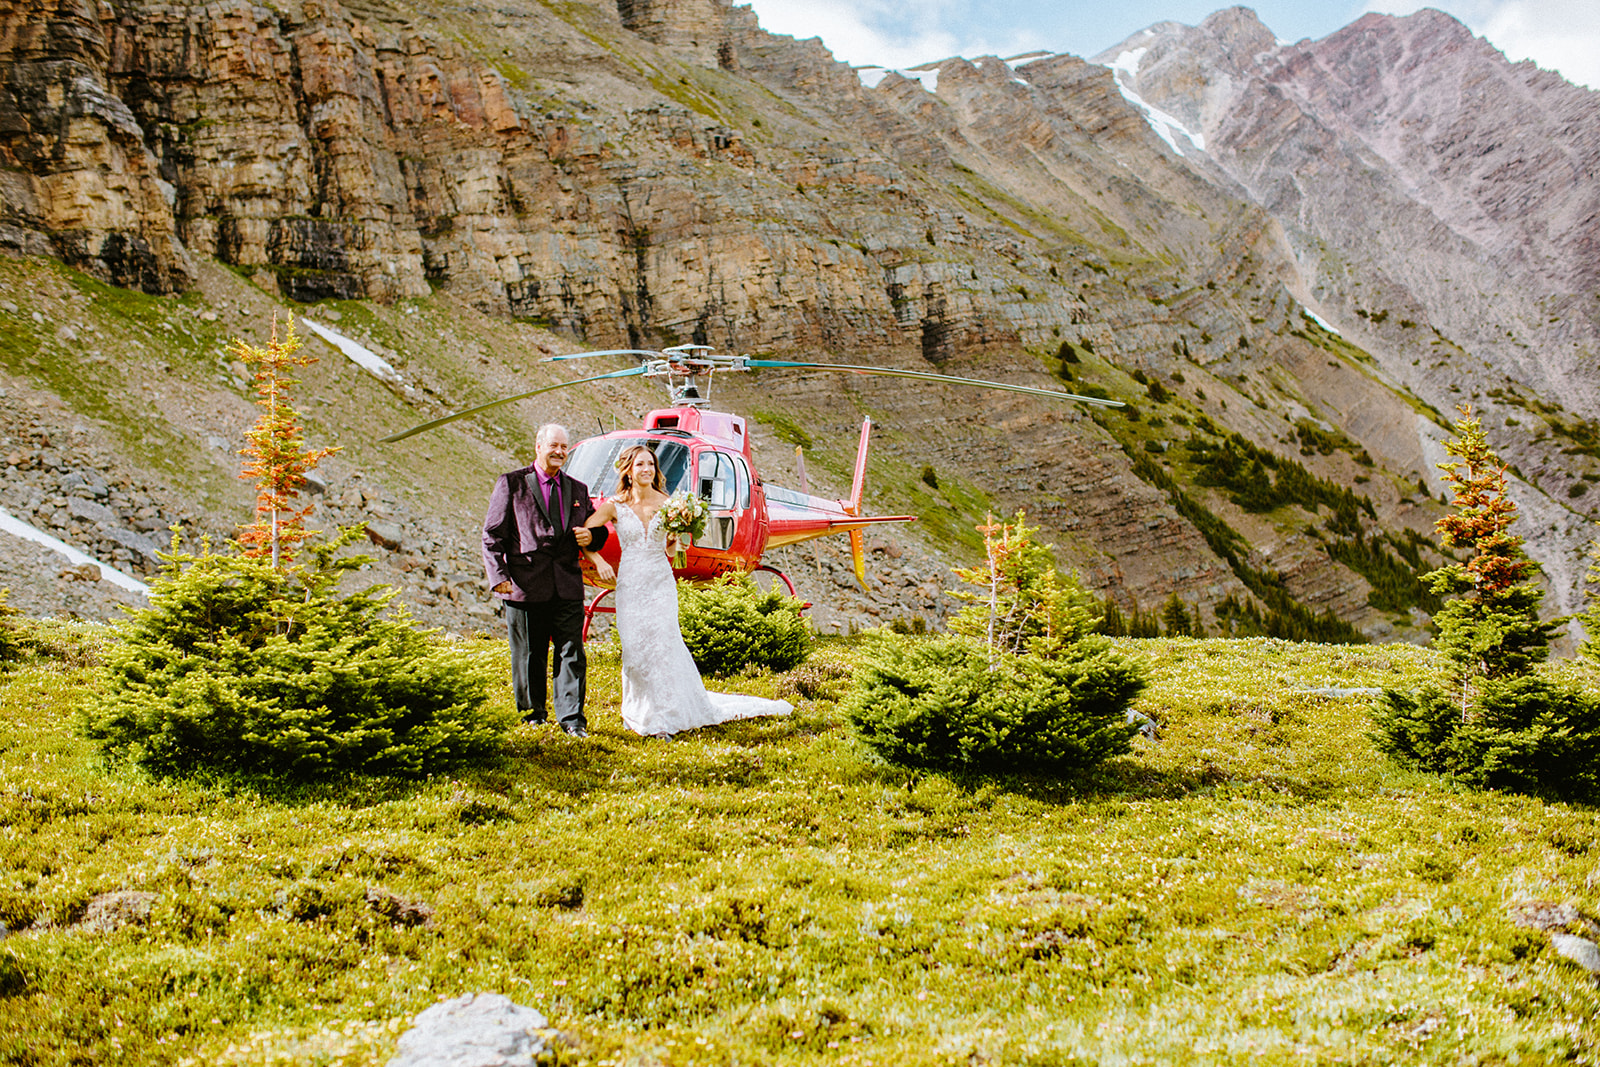 Karissa wearing the Tara Lauren Montgomery bridal gown